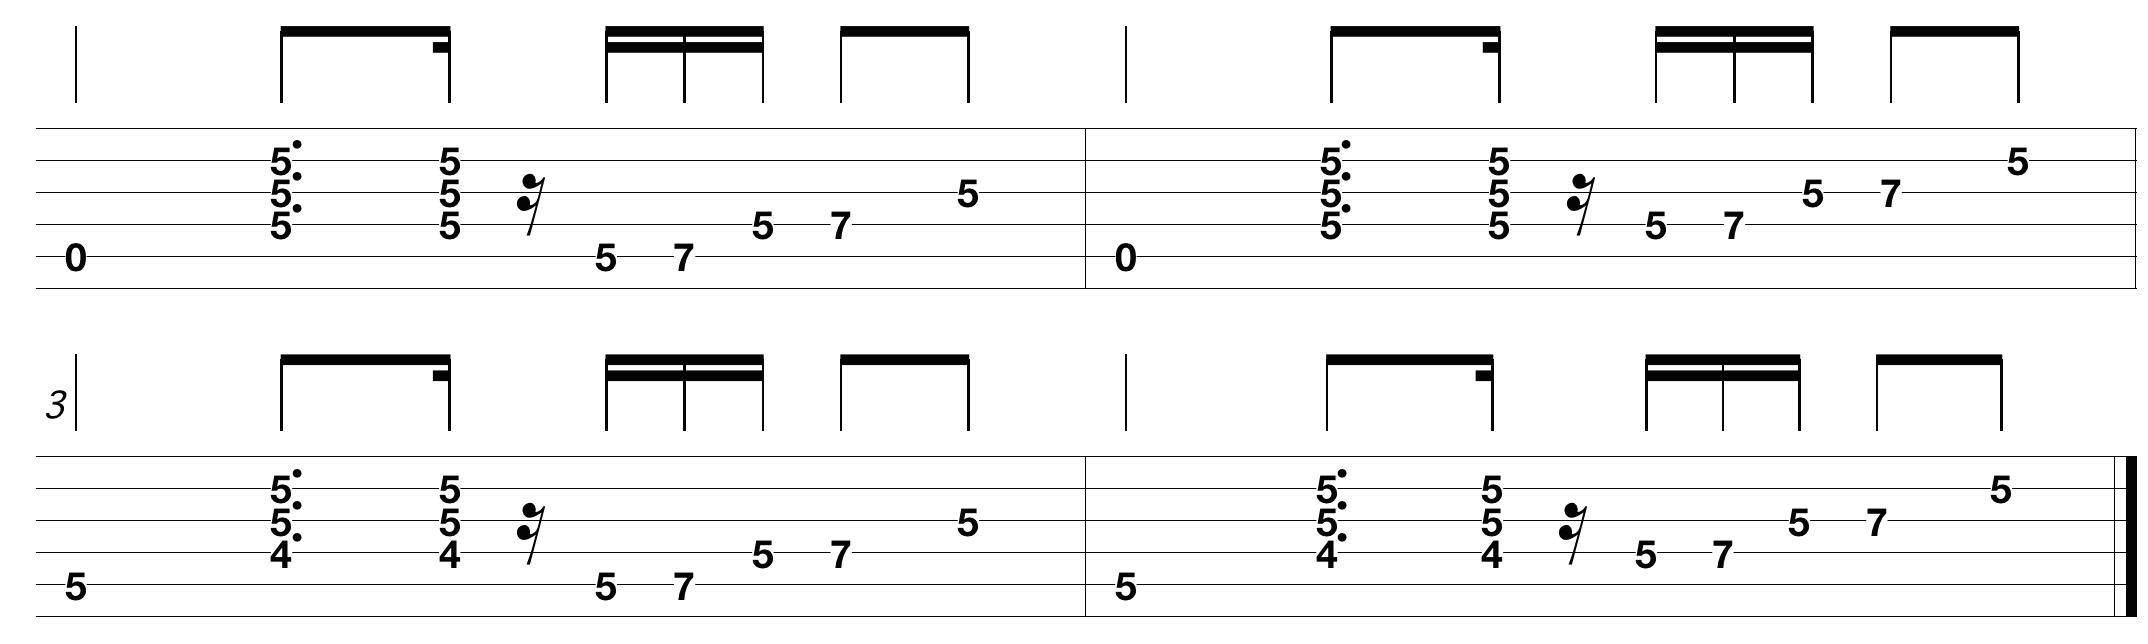 rhythm-guitars_3.png